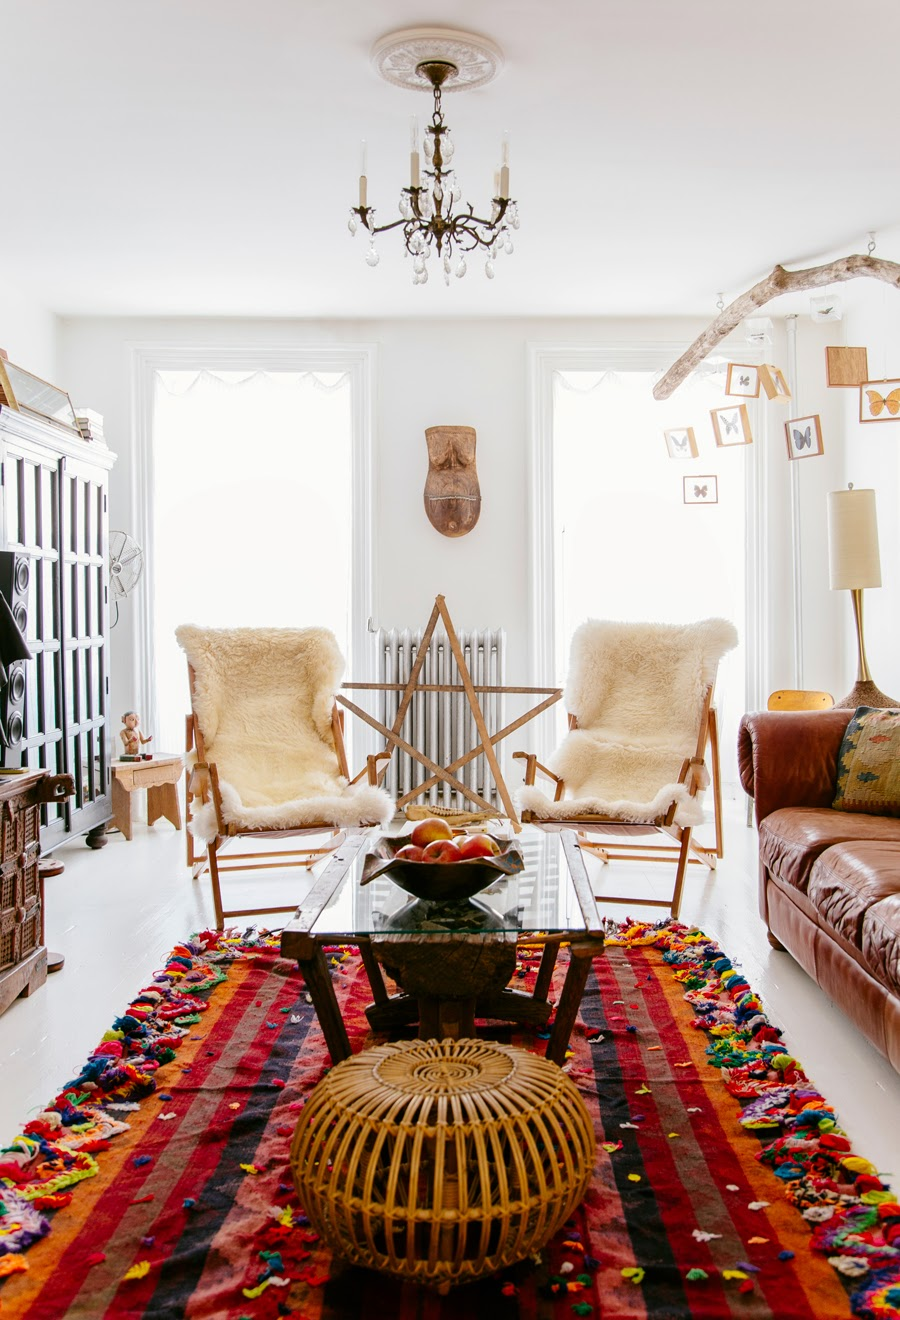 inspiration bohemian interiors seaofgirasoles. Black Bedroom Furniture Sets. Home Design Ideas